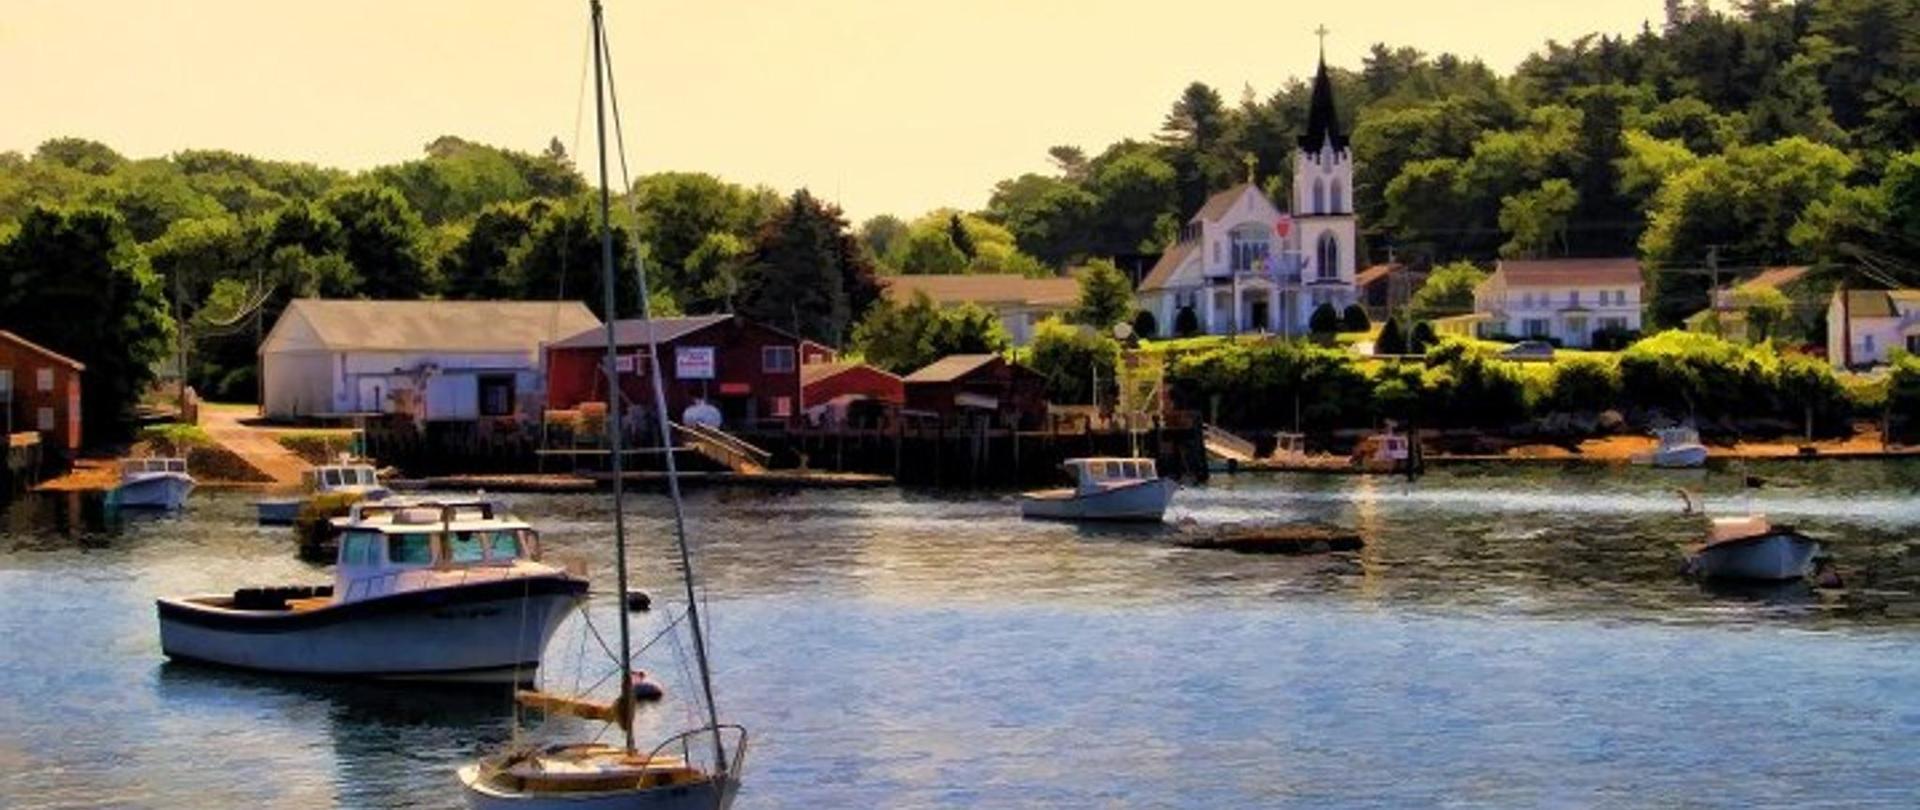 Harbour boats.jpg